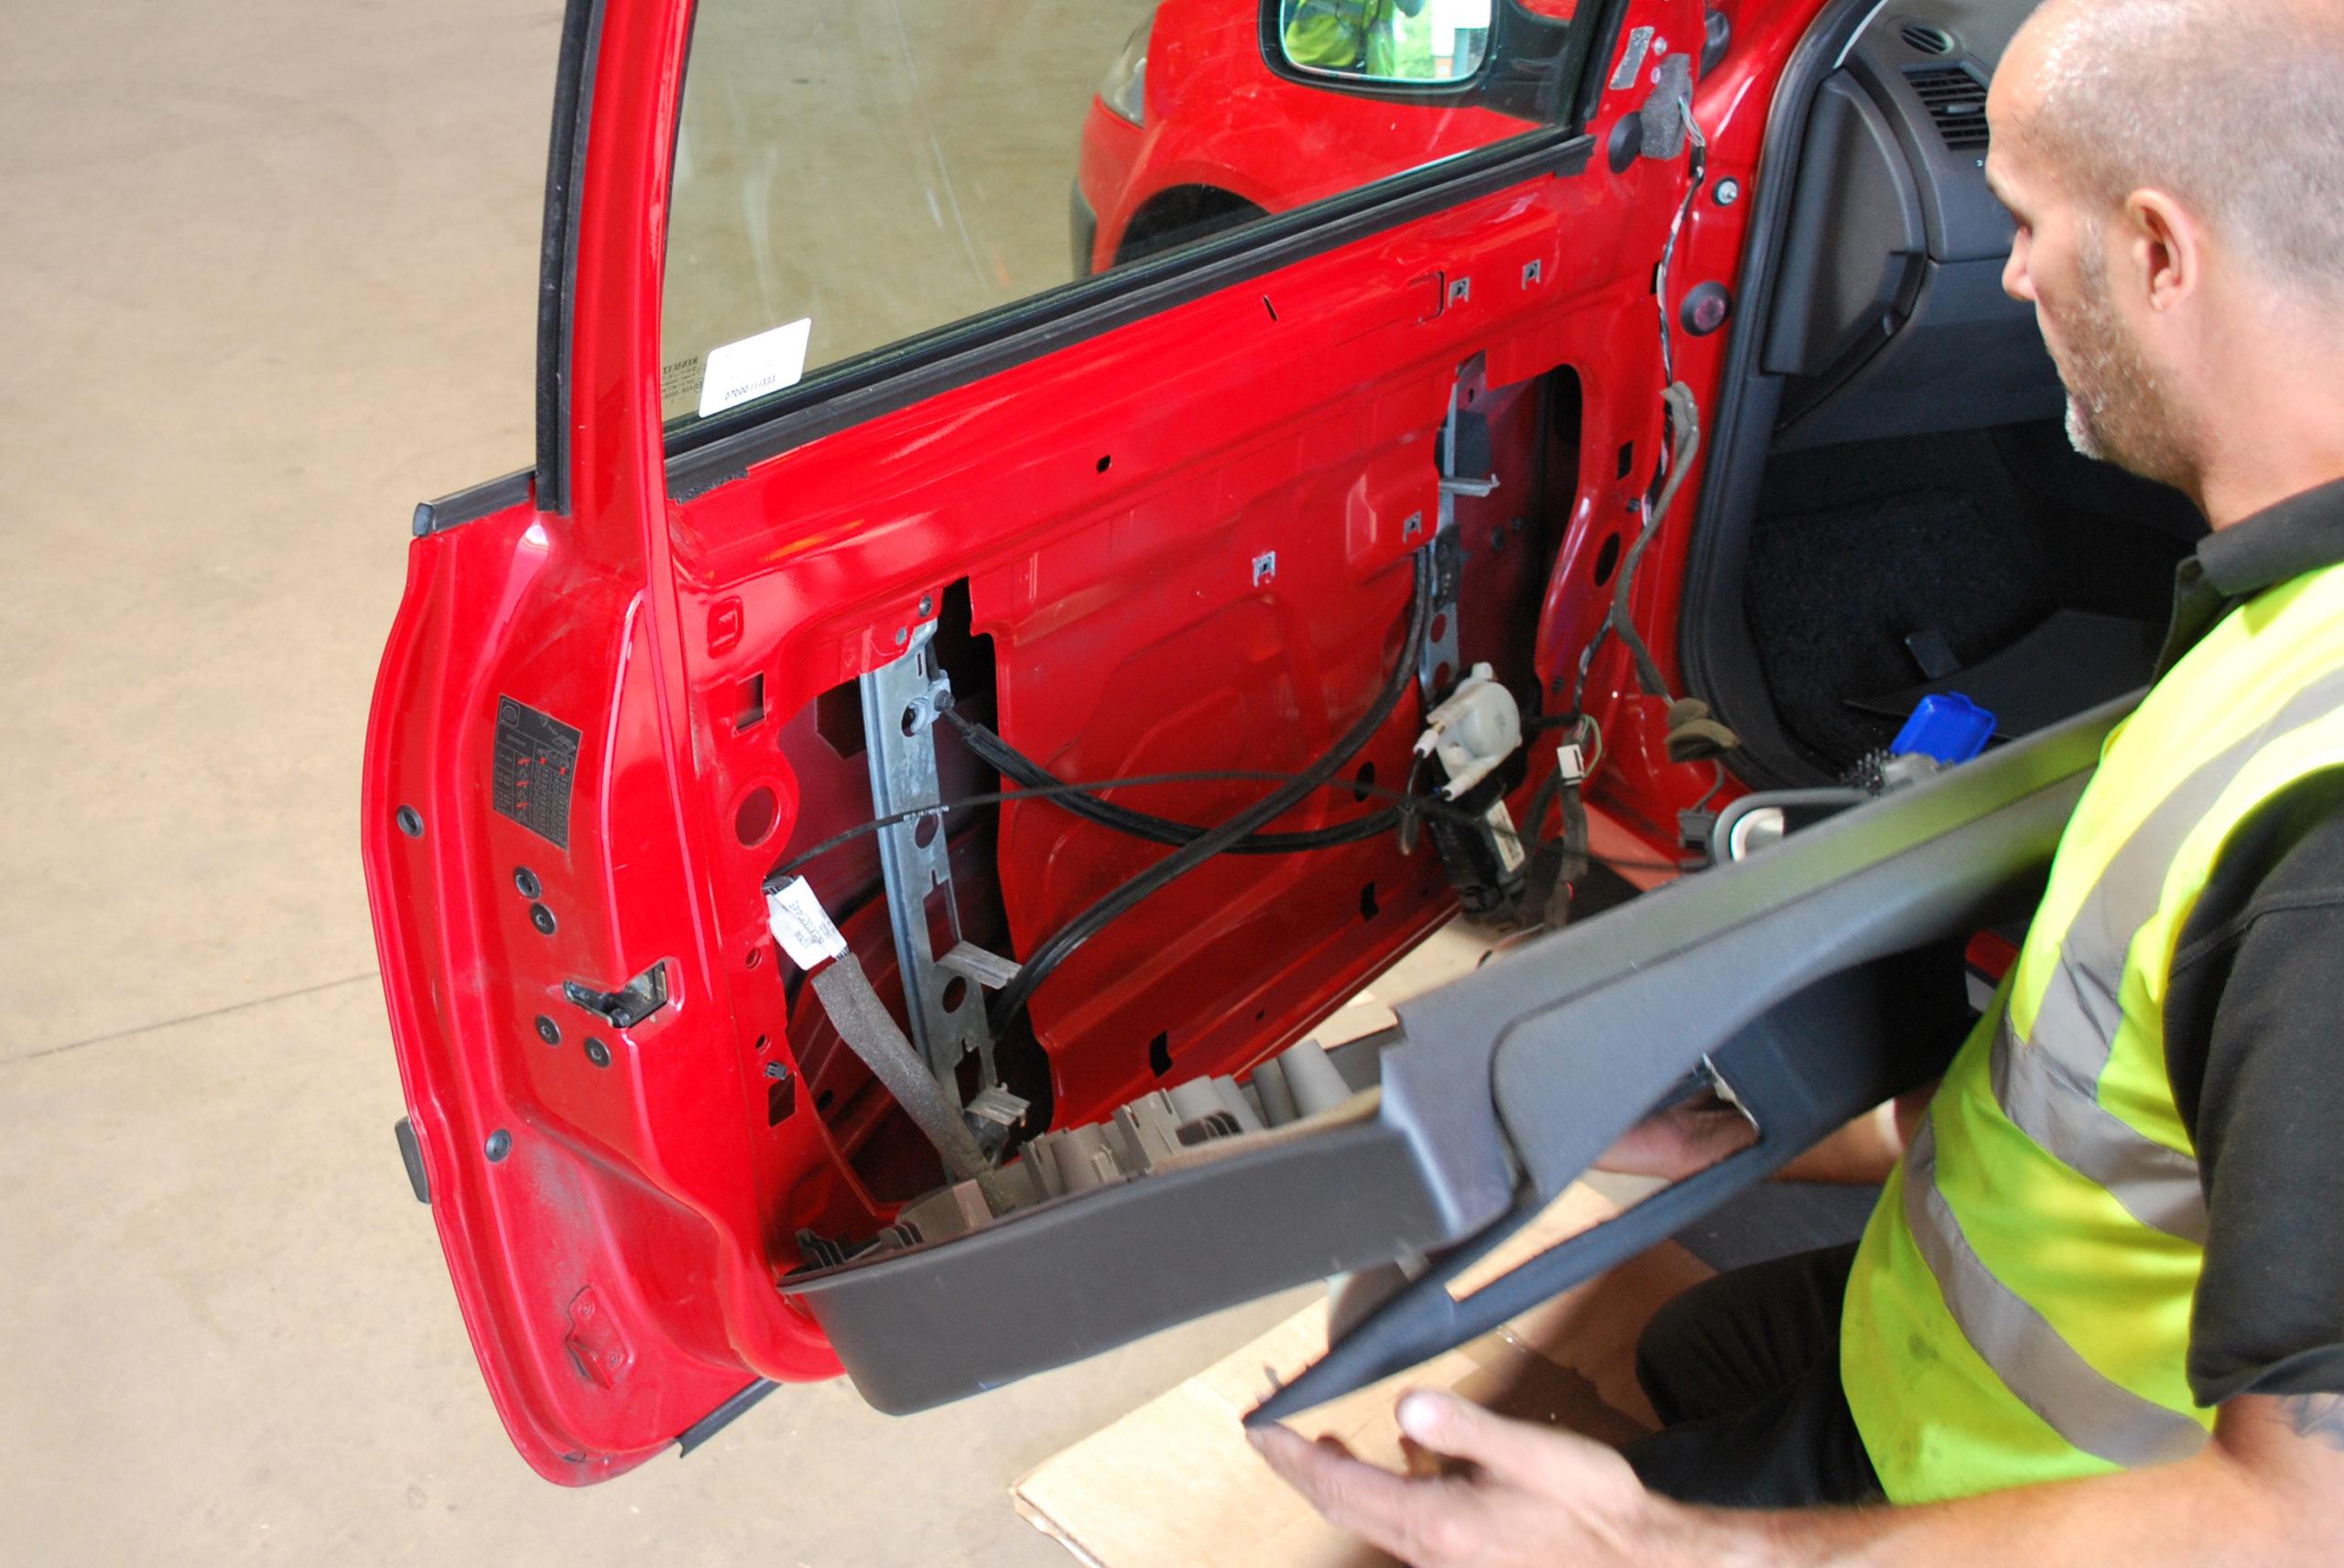 Replacing a window lift regulator